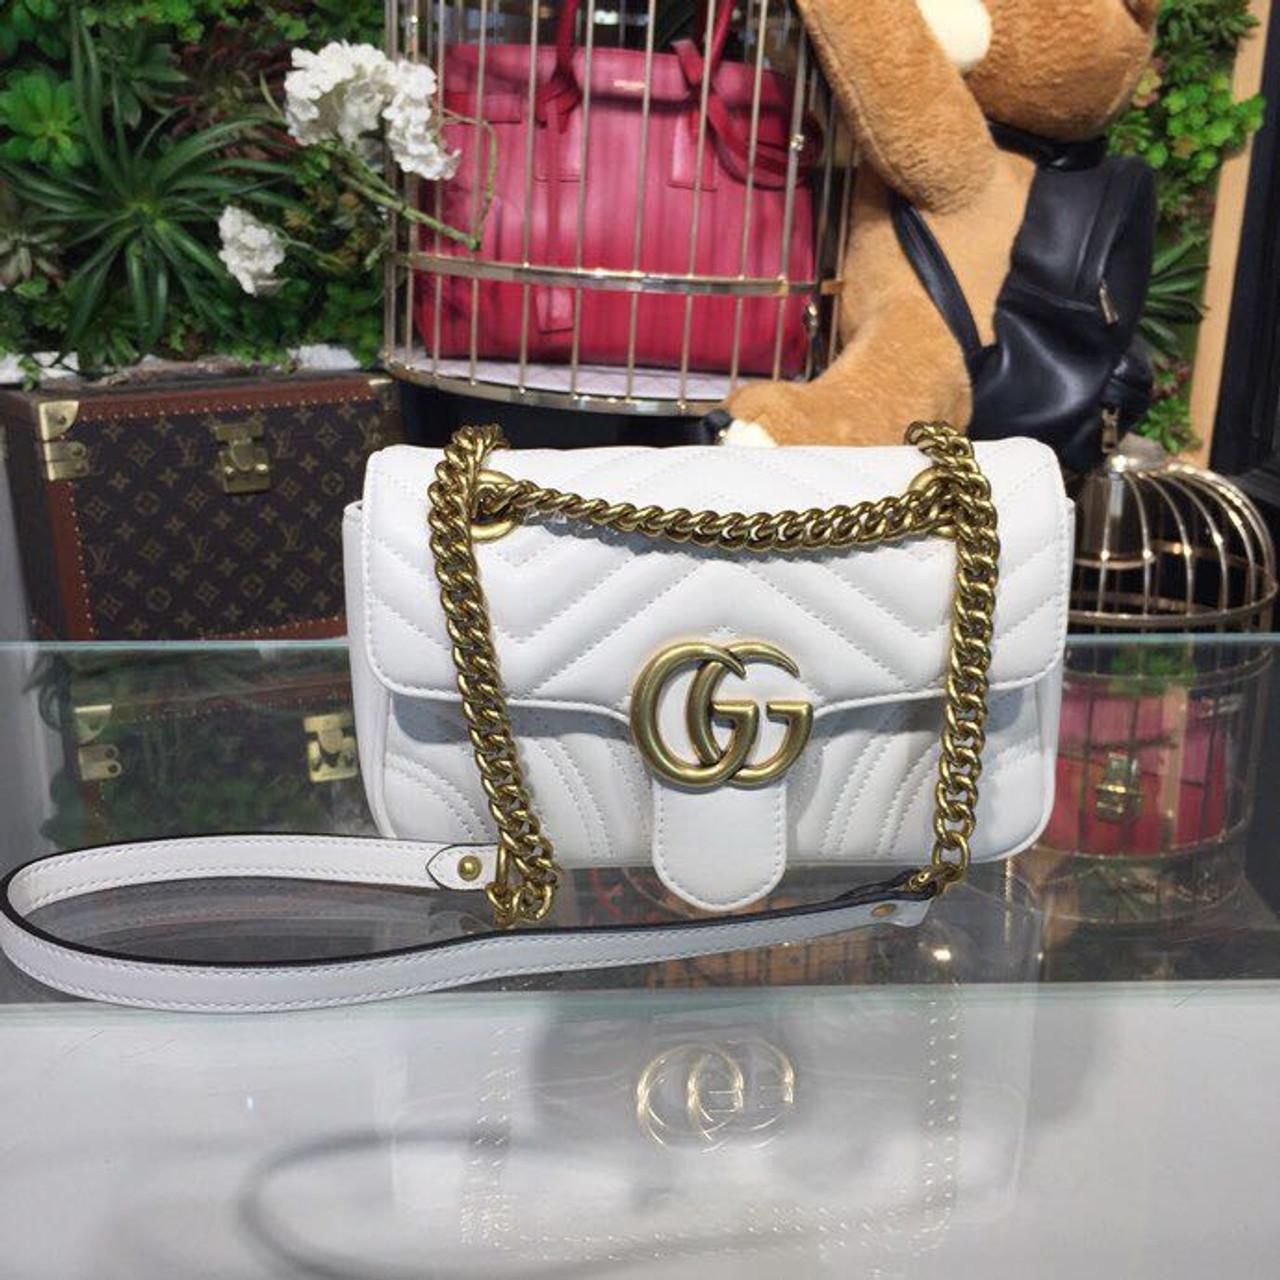 bbe899661776 Gucci Marmont Matelassé Shoulder Bag 22cm 443497 Calfskin Leather  Spring/Summer 2018 Collection, White